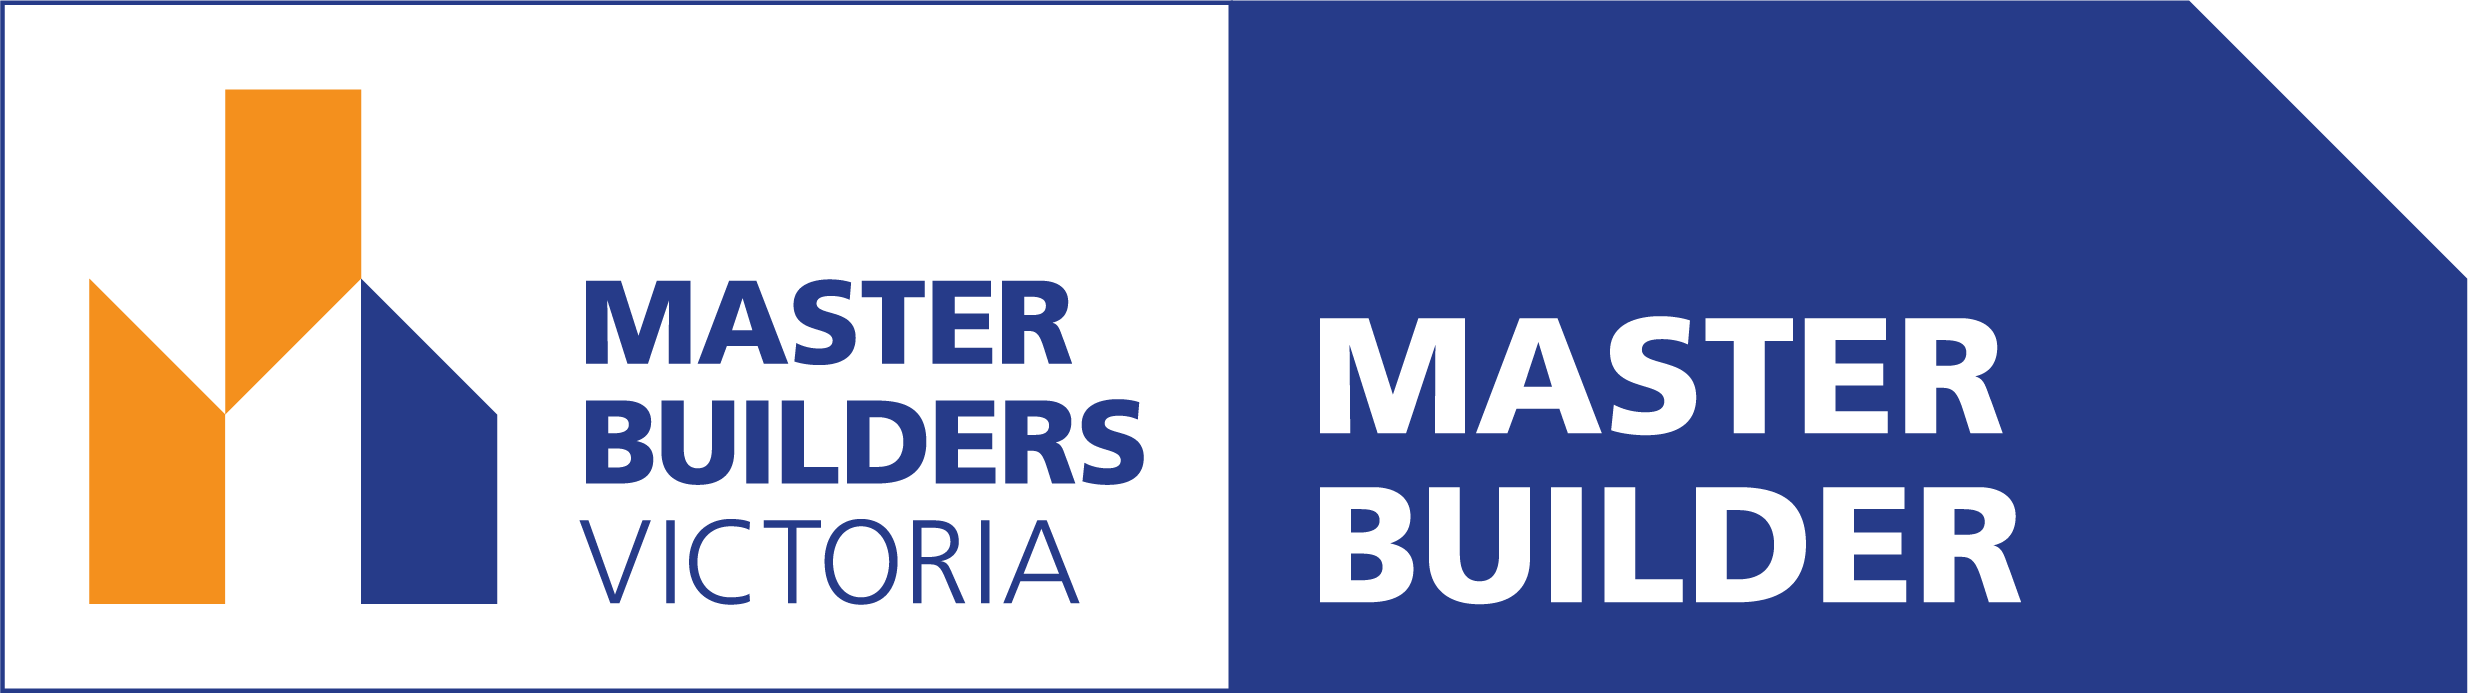 Master Builder Victoria